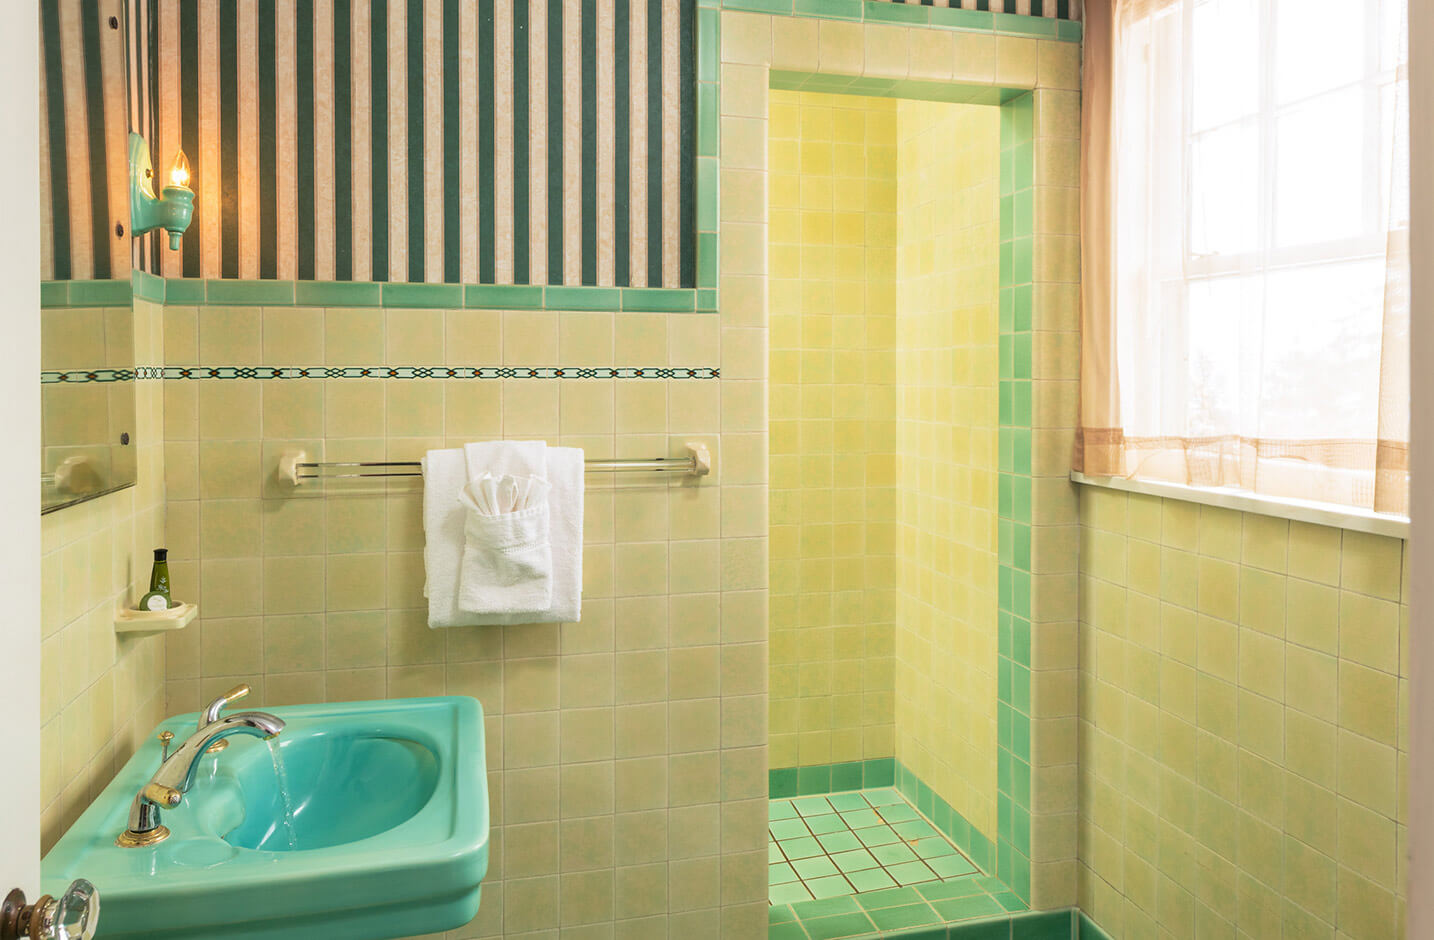 Seneca Lake Accommodations - Room 9 bathroom